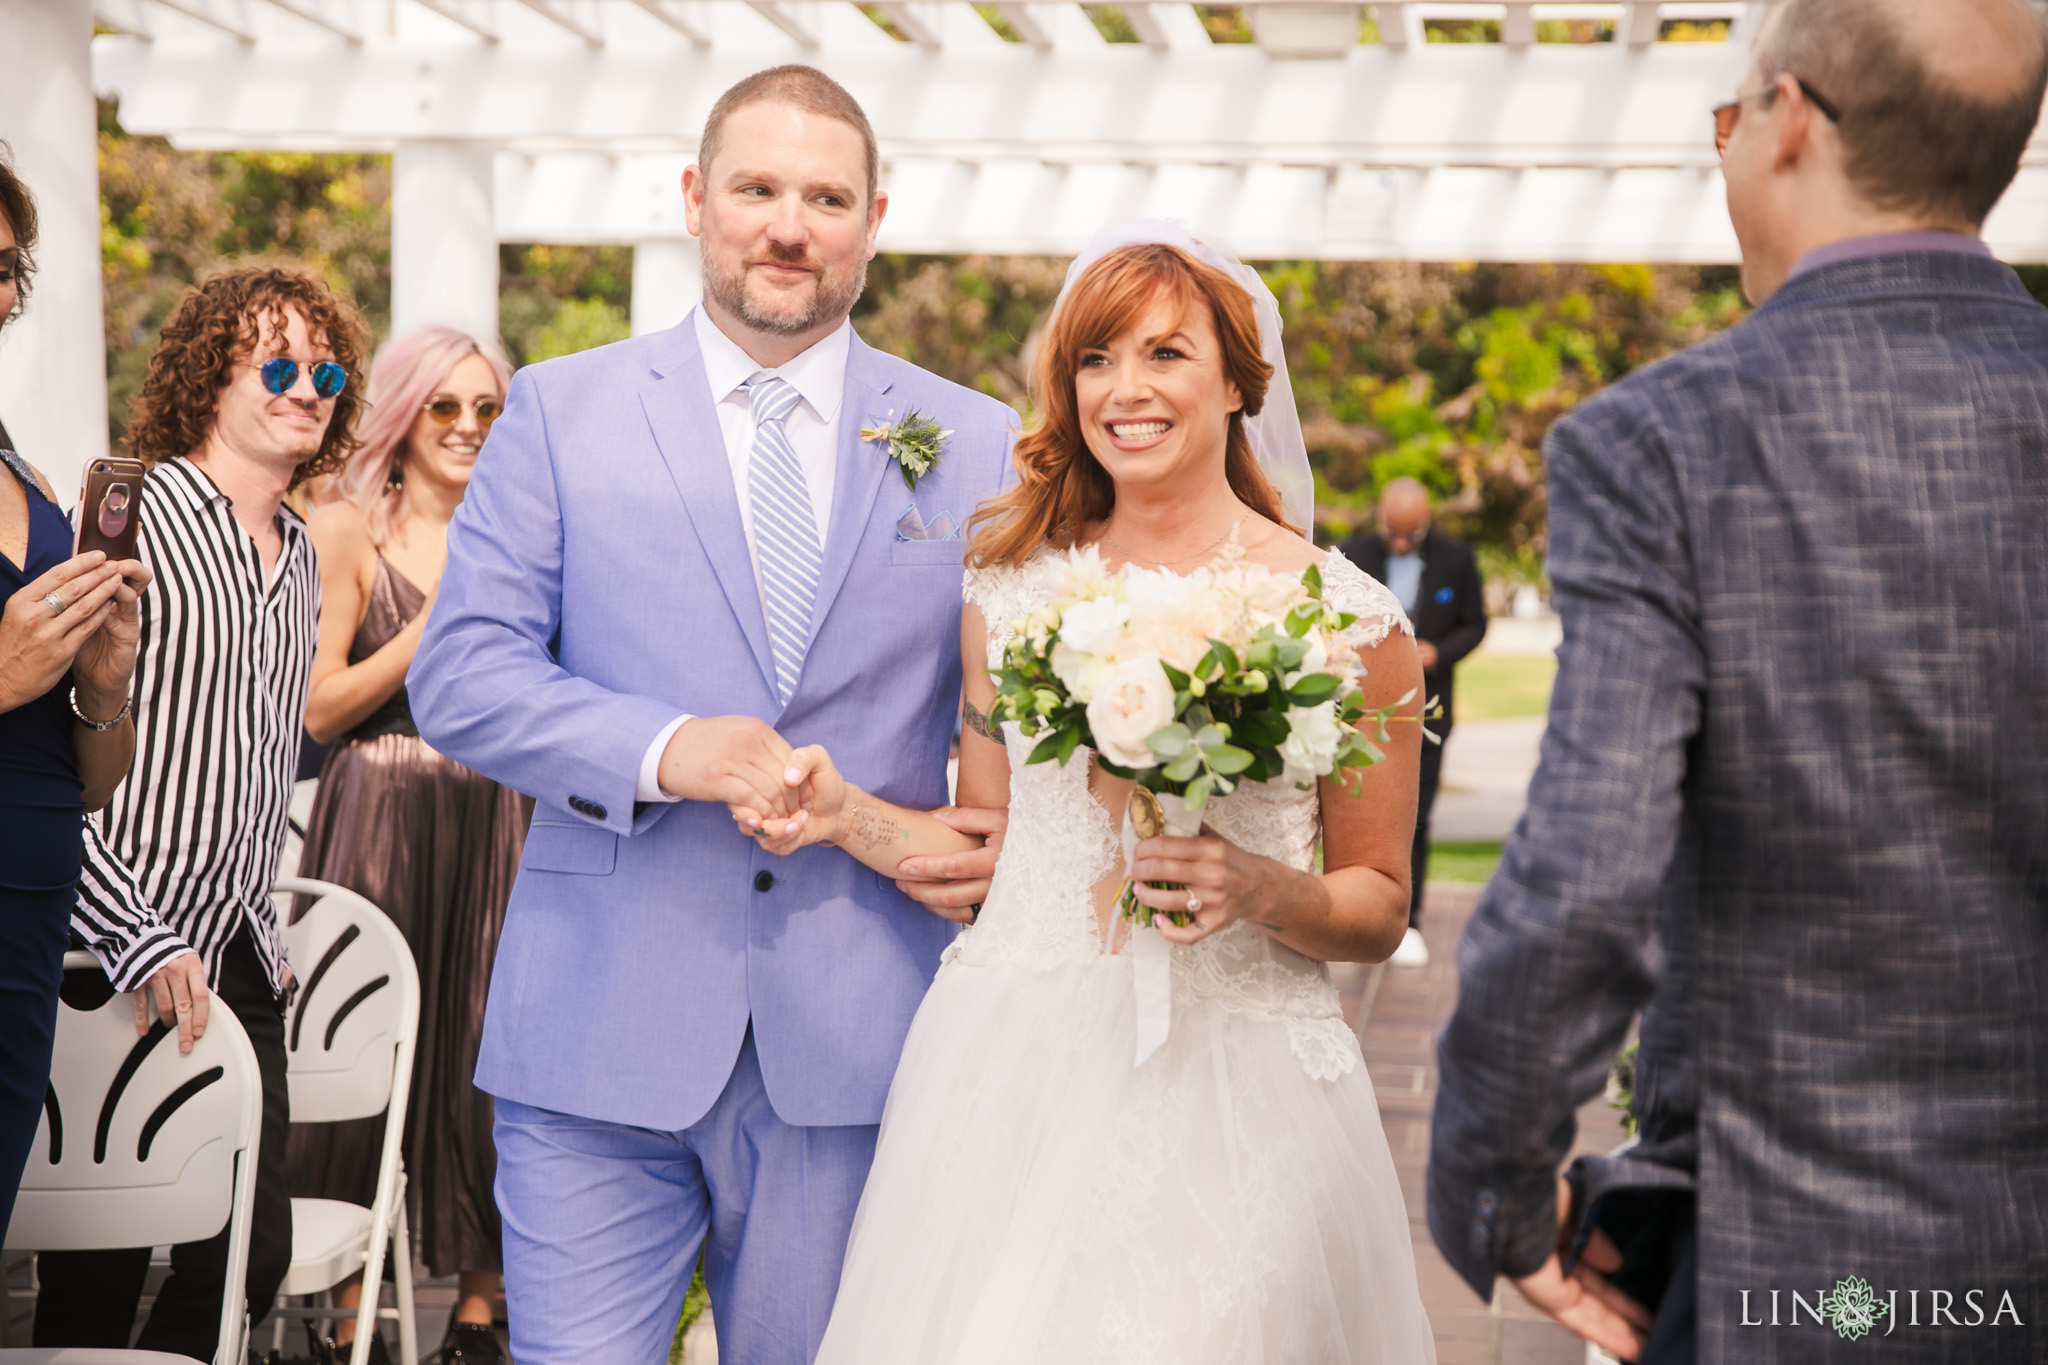 013 marina del rey hotel wedding photography